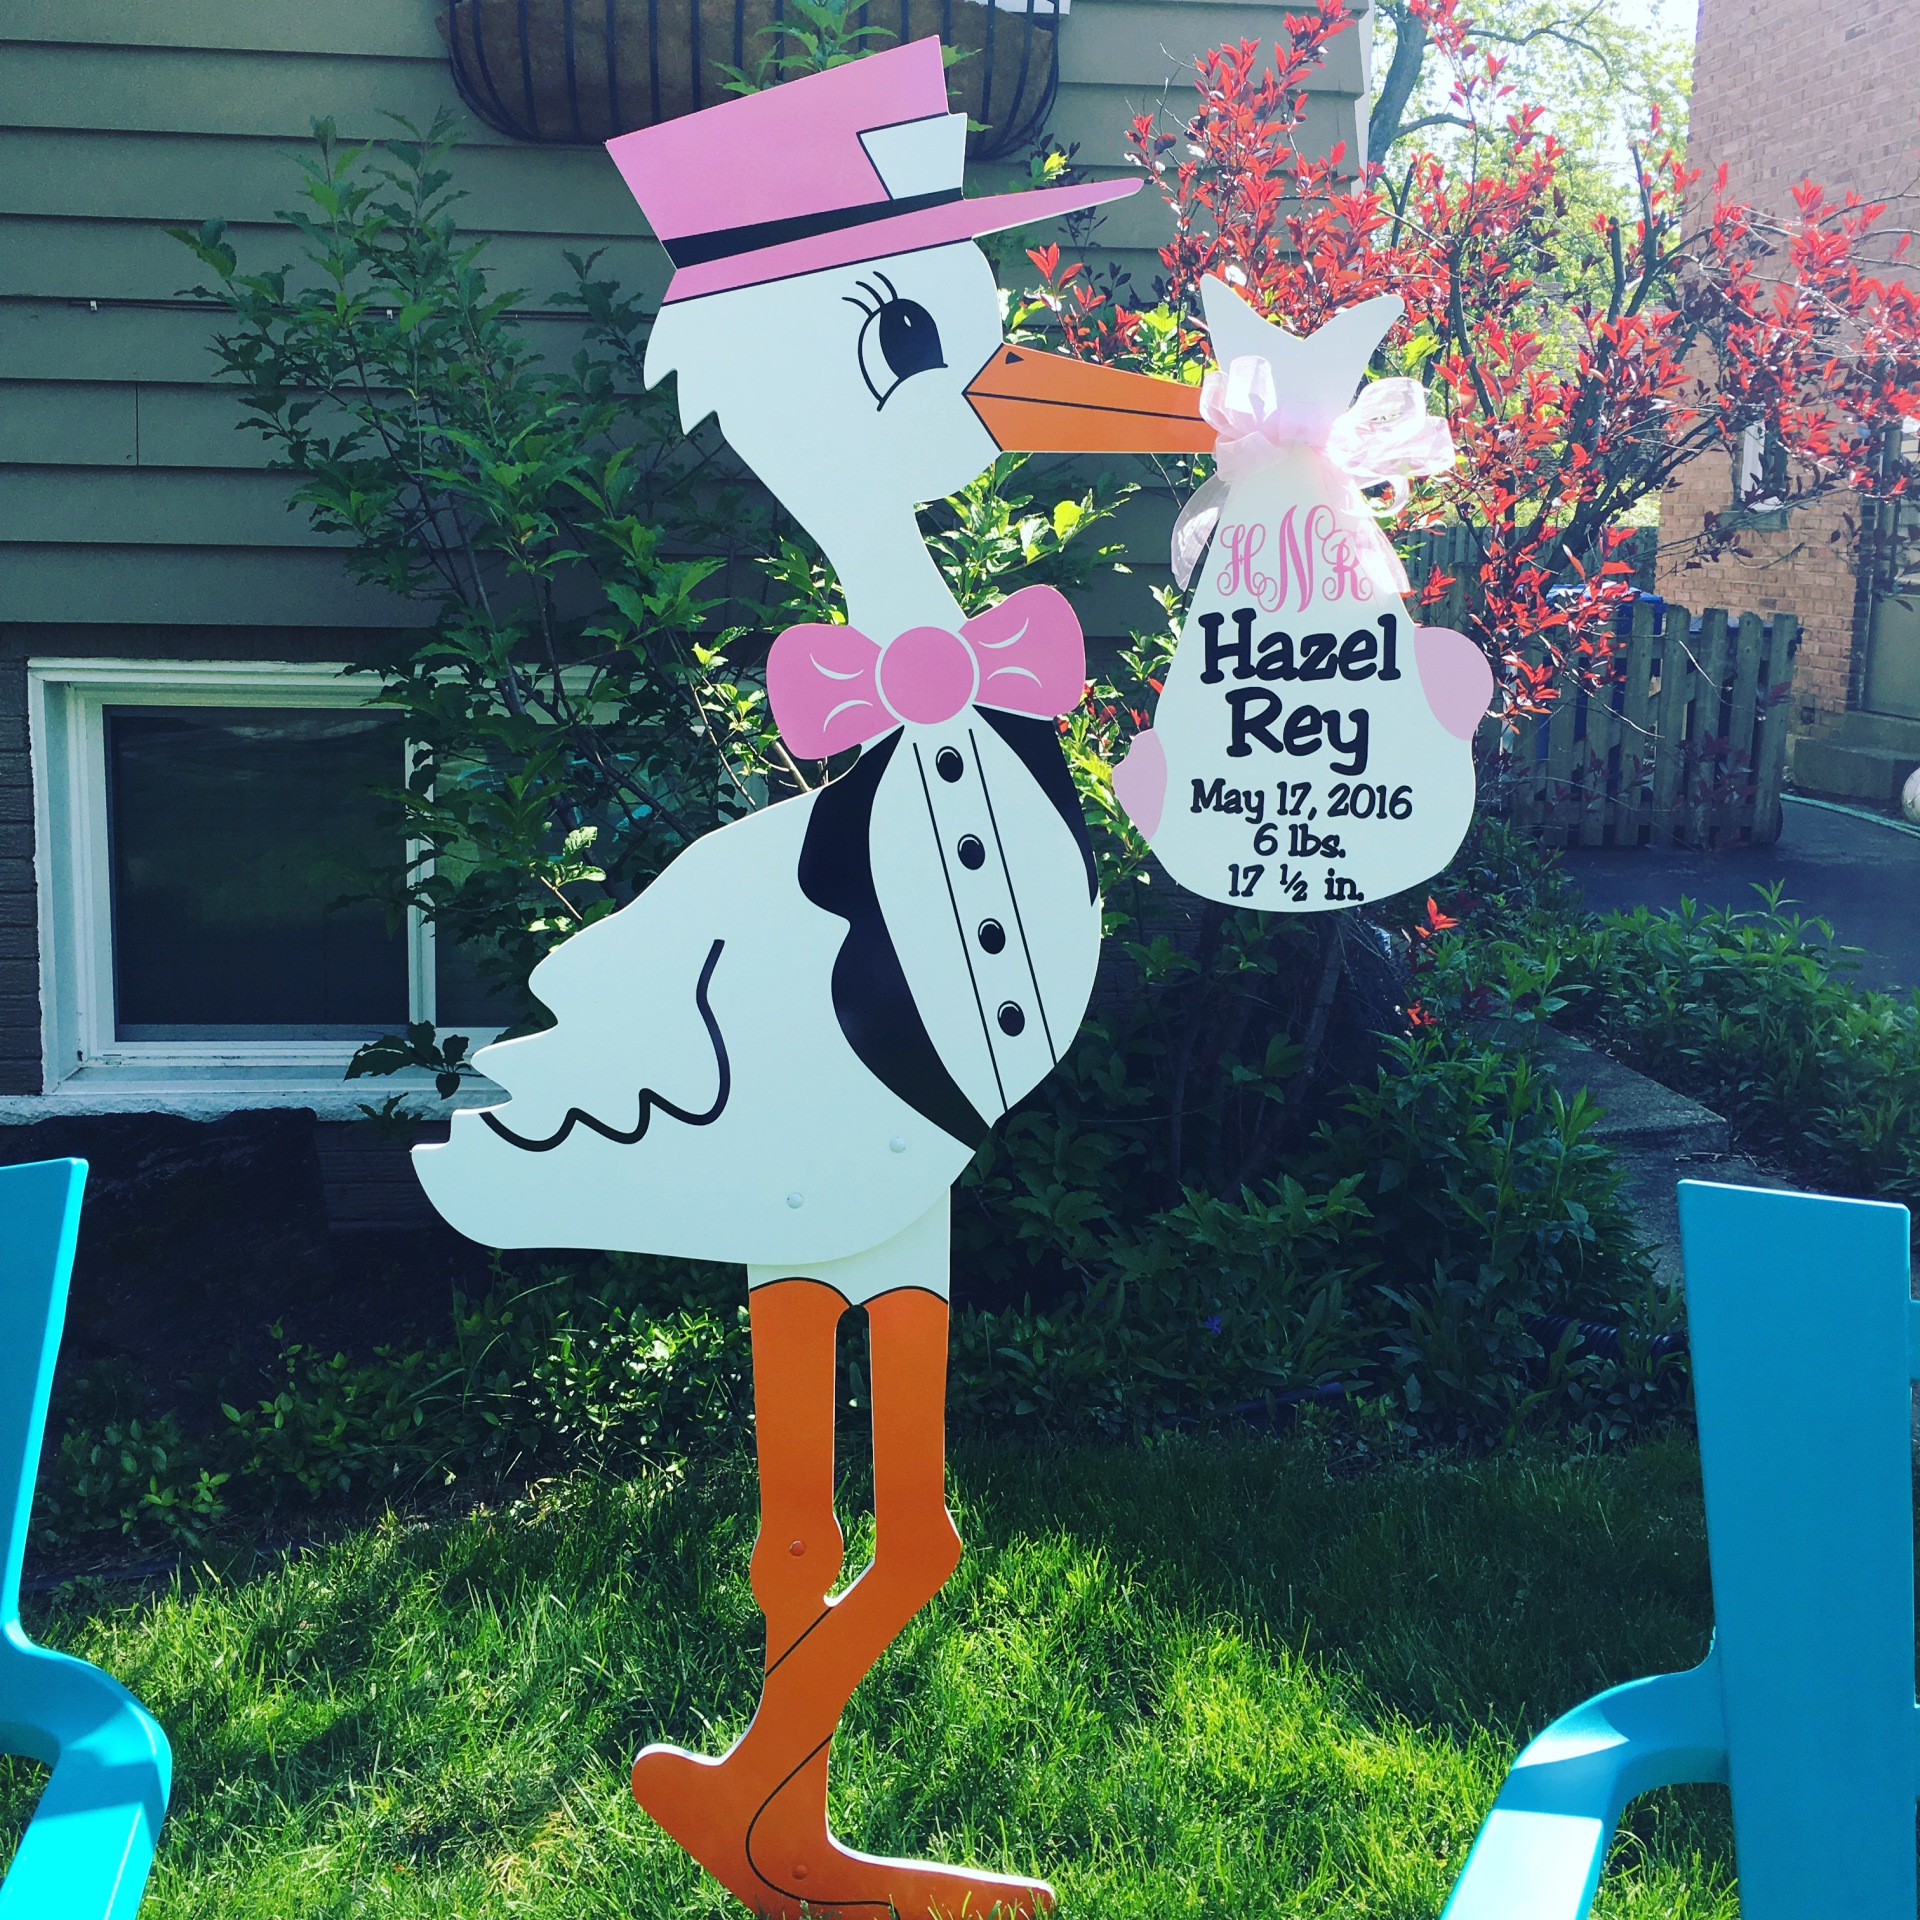 stork sign rentals, stork birth announcement, rent a stork, chicago storks